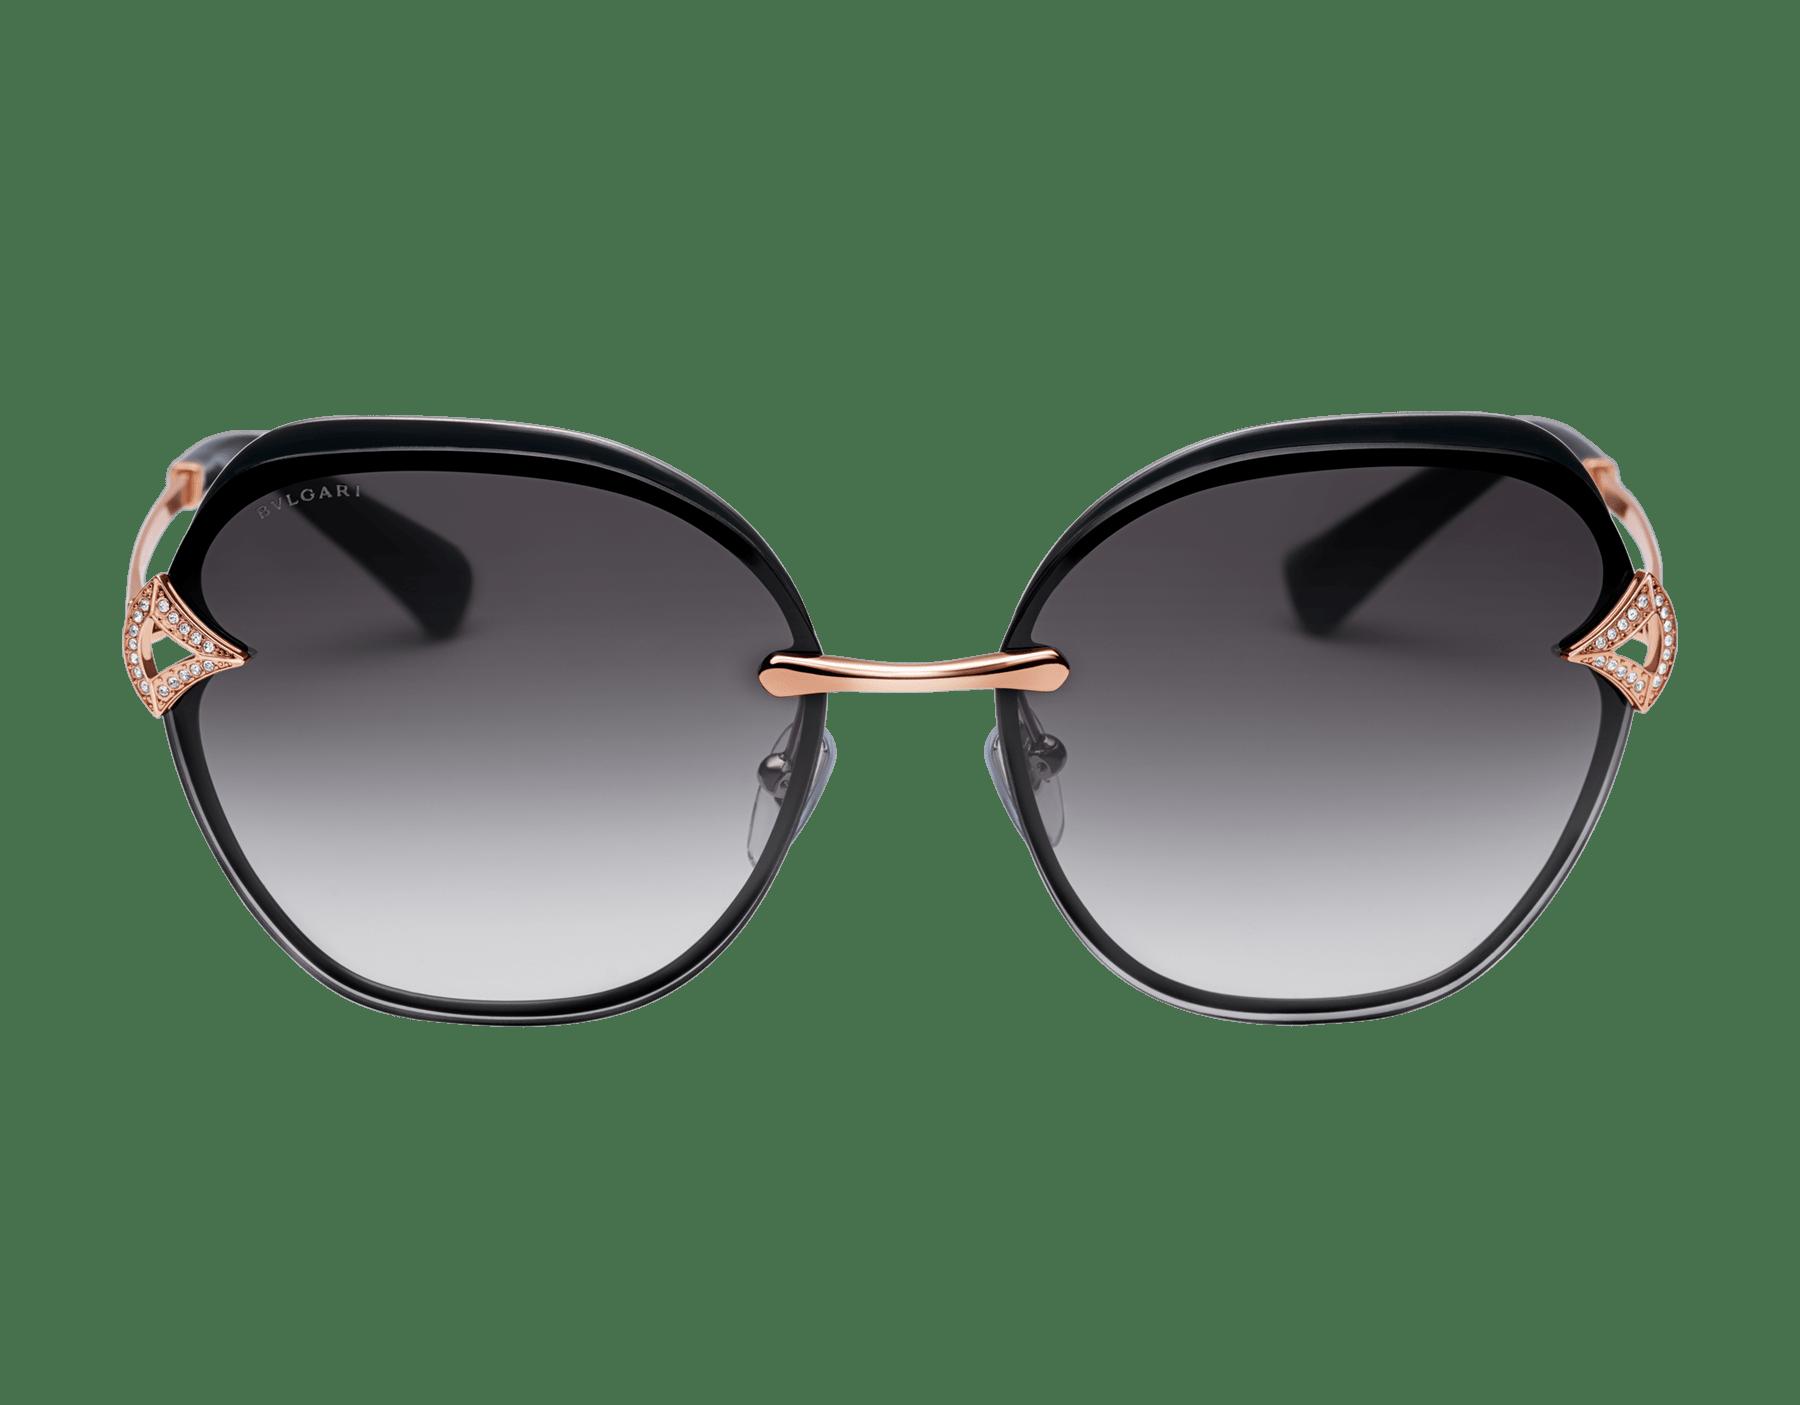 Bvlgari DIVAS' DREAM angular squared metal sunglasses 903667 image 2